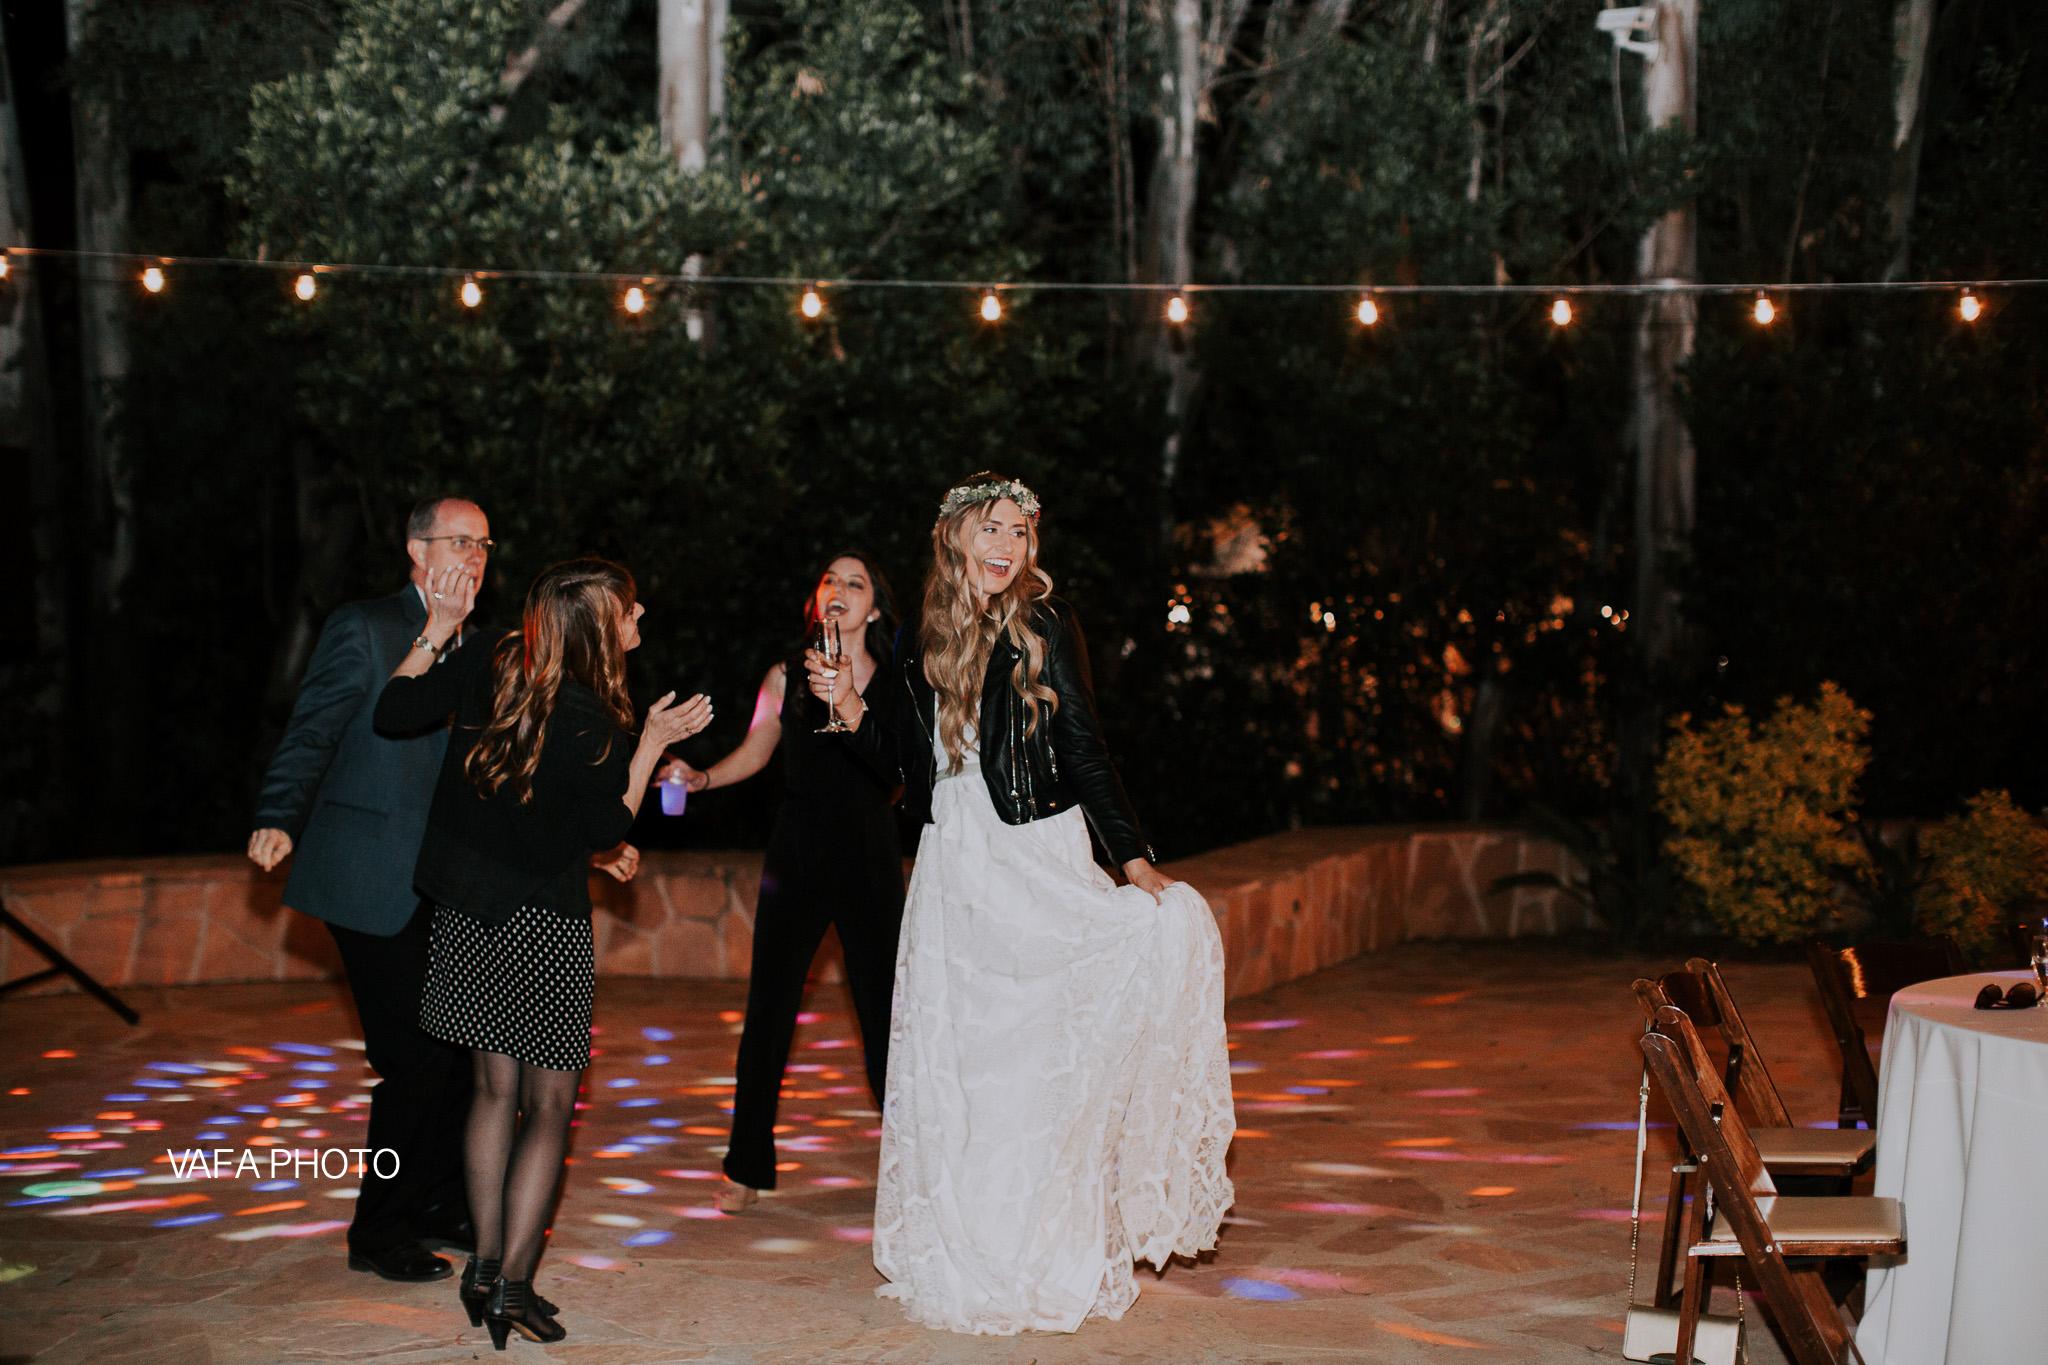 Leo-Carrillo-Ranch-Wedding-Lauren-Mike-Vafa-Photo-1092.jpg